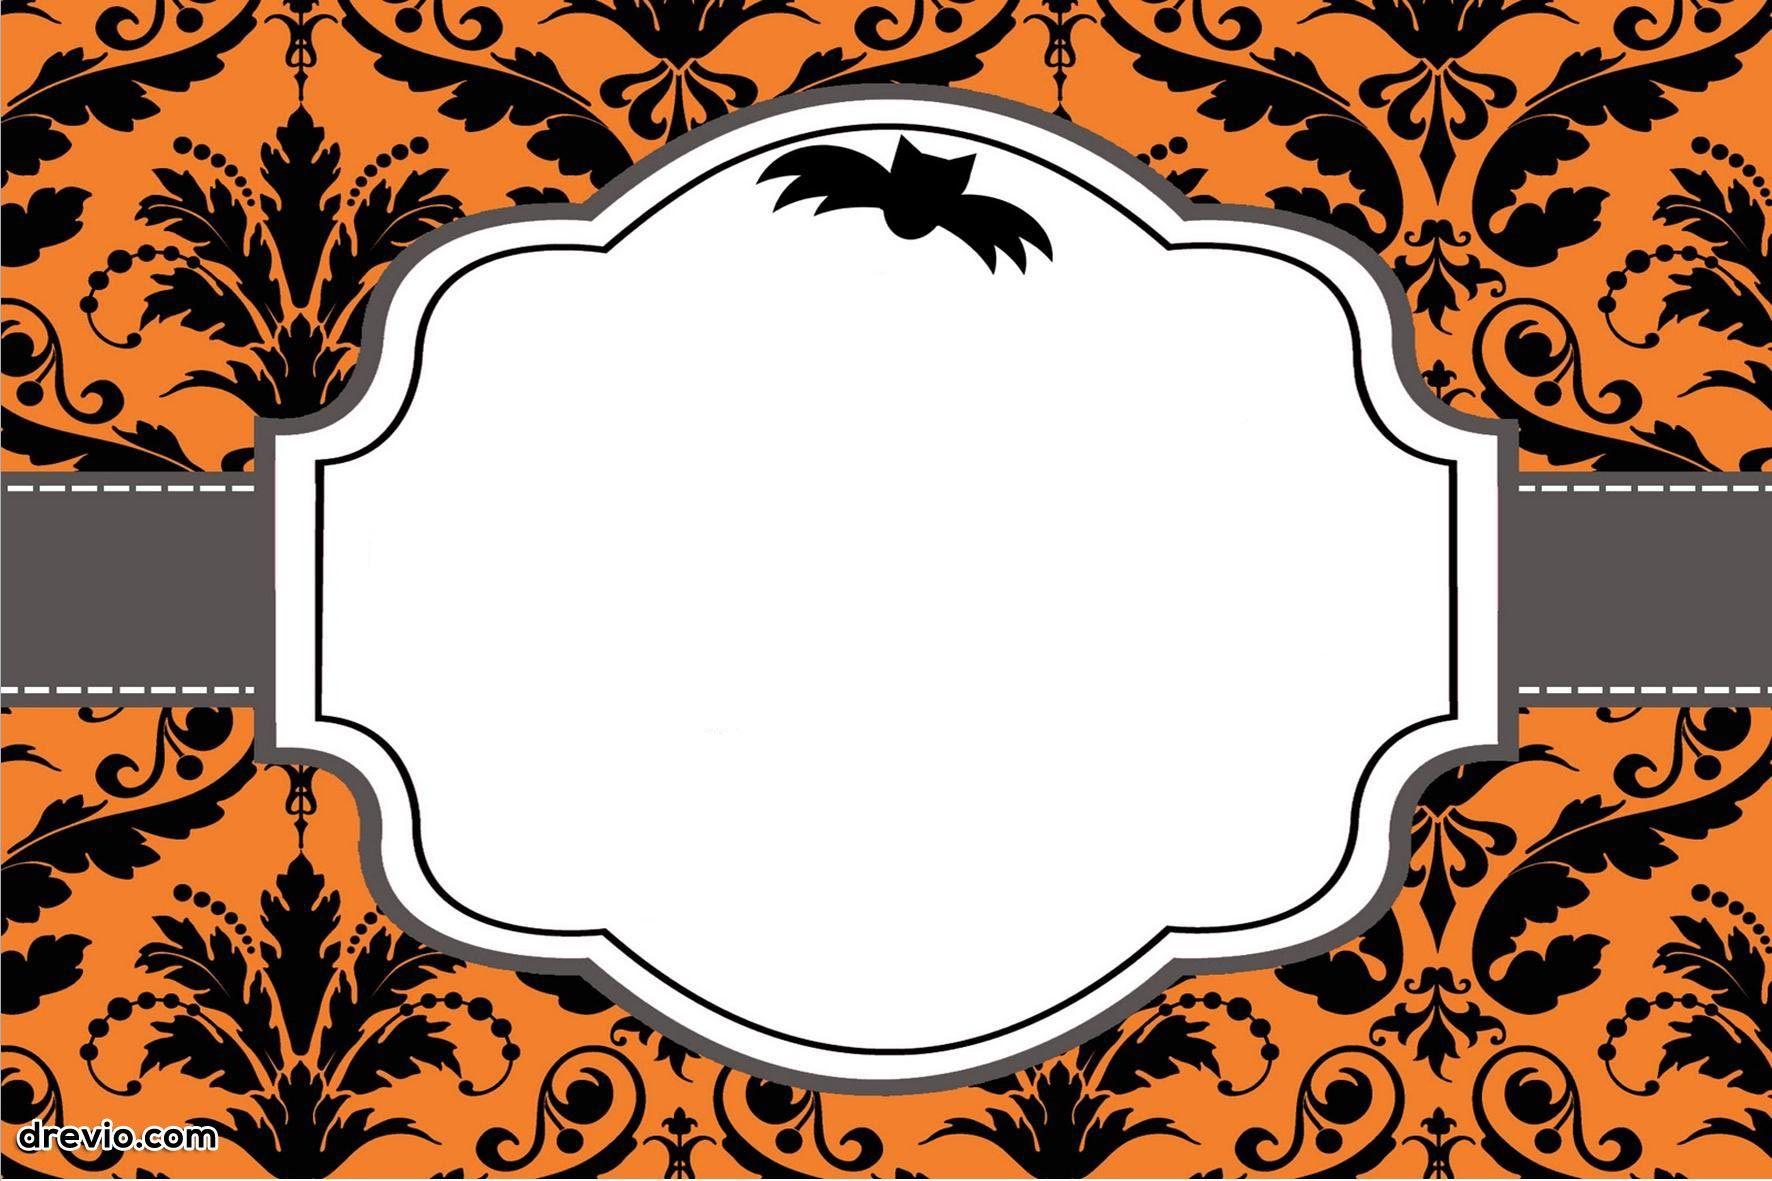 Free Printable Halloween Invitations | Free Printable Birthday - Free Halloween Birthday Invitation Templates Printable